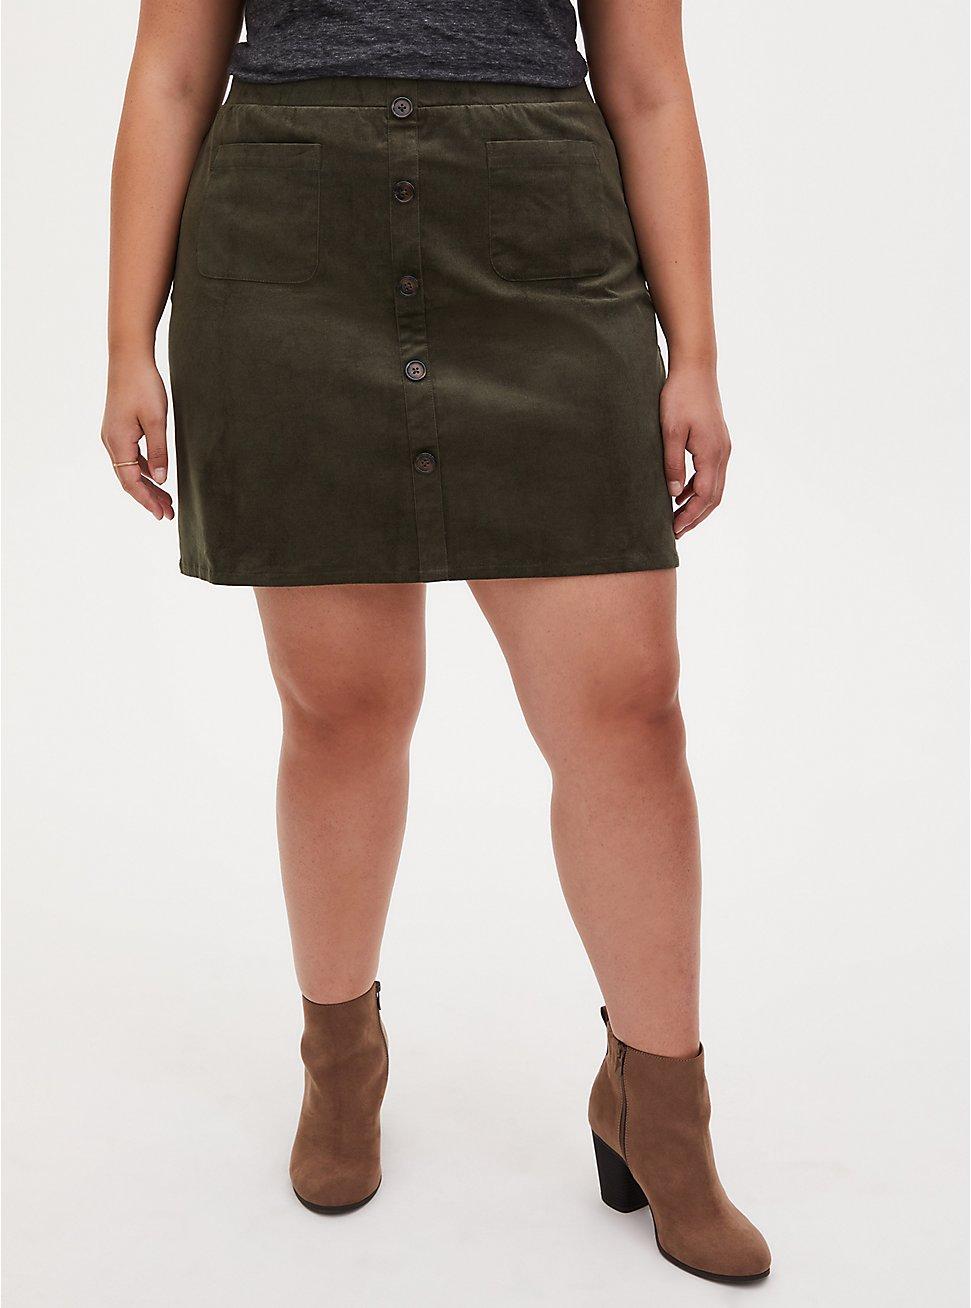 Olive Green Corduroy Button Mini Skirt, DEEP DEPTHS, hi-res